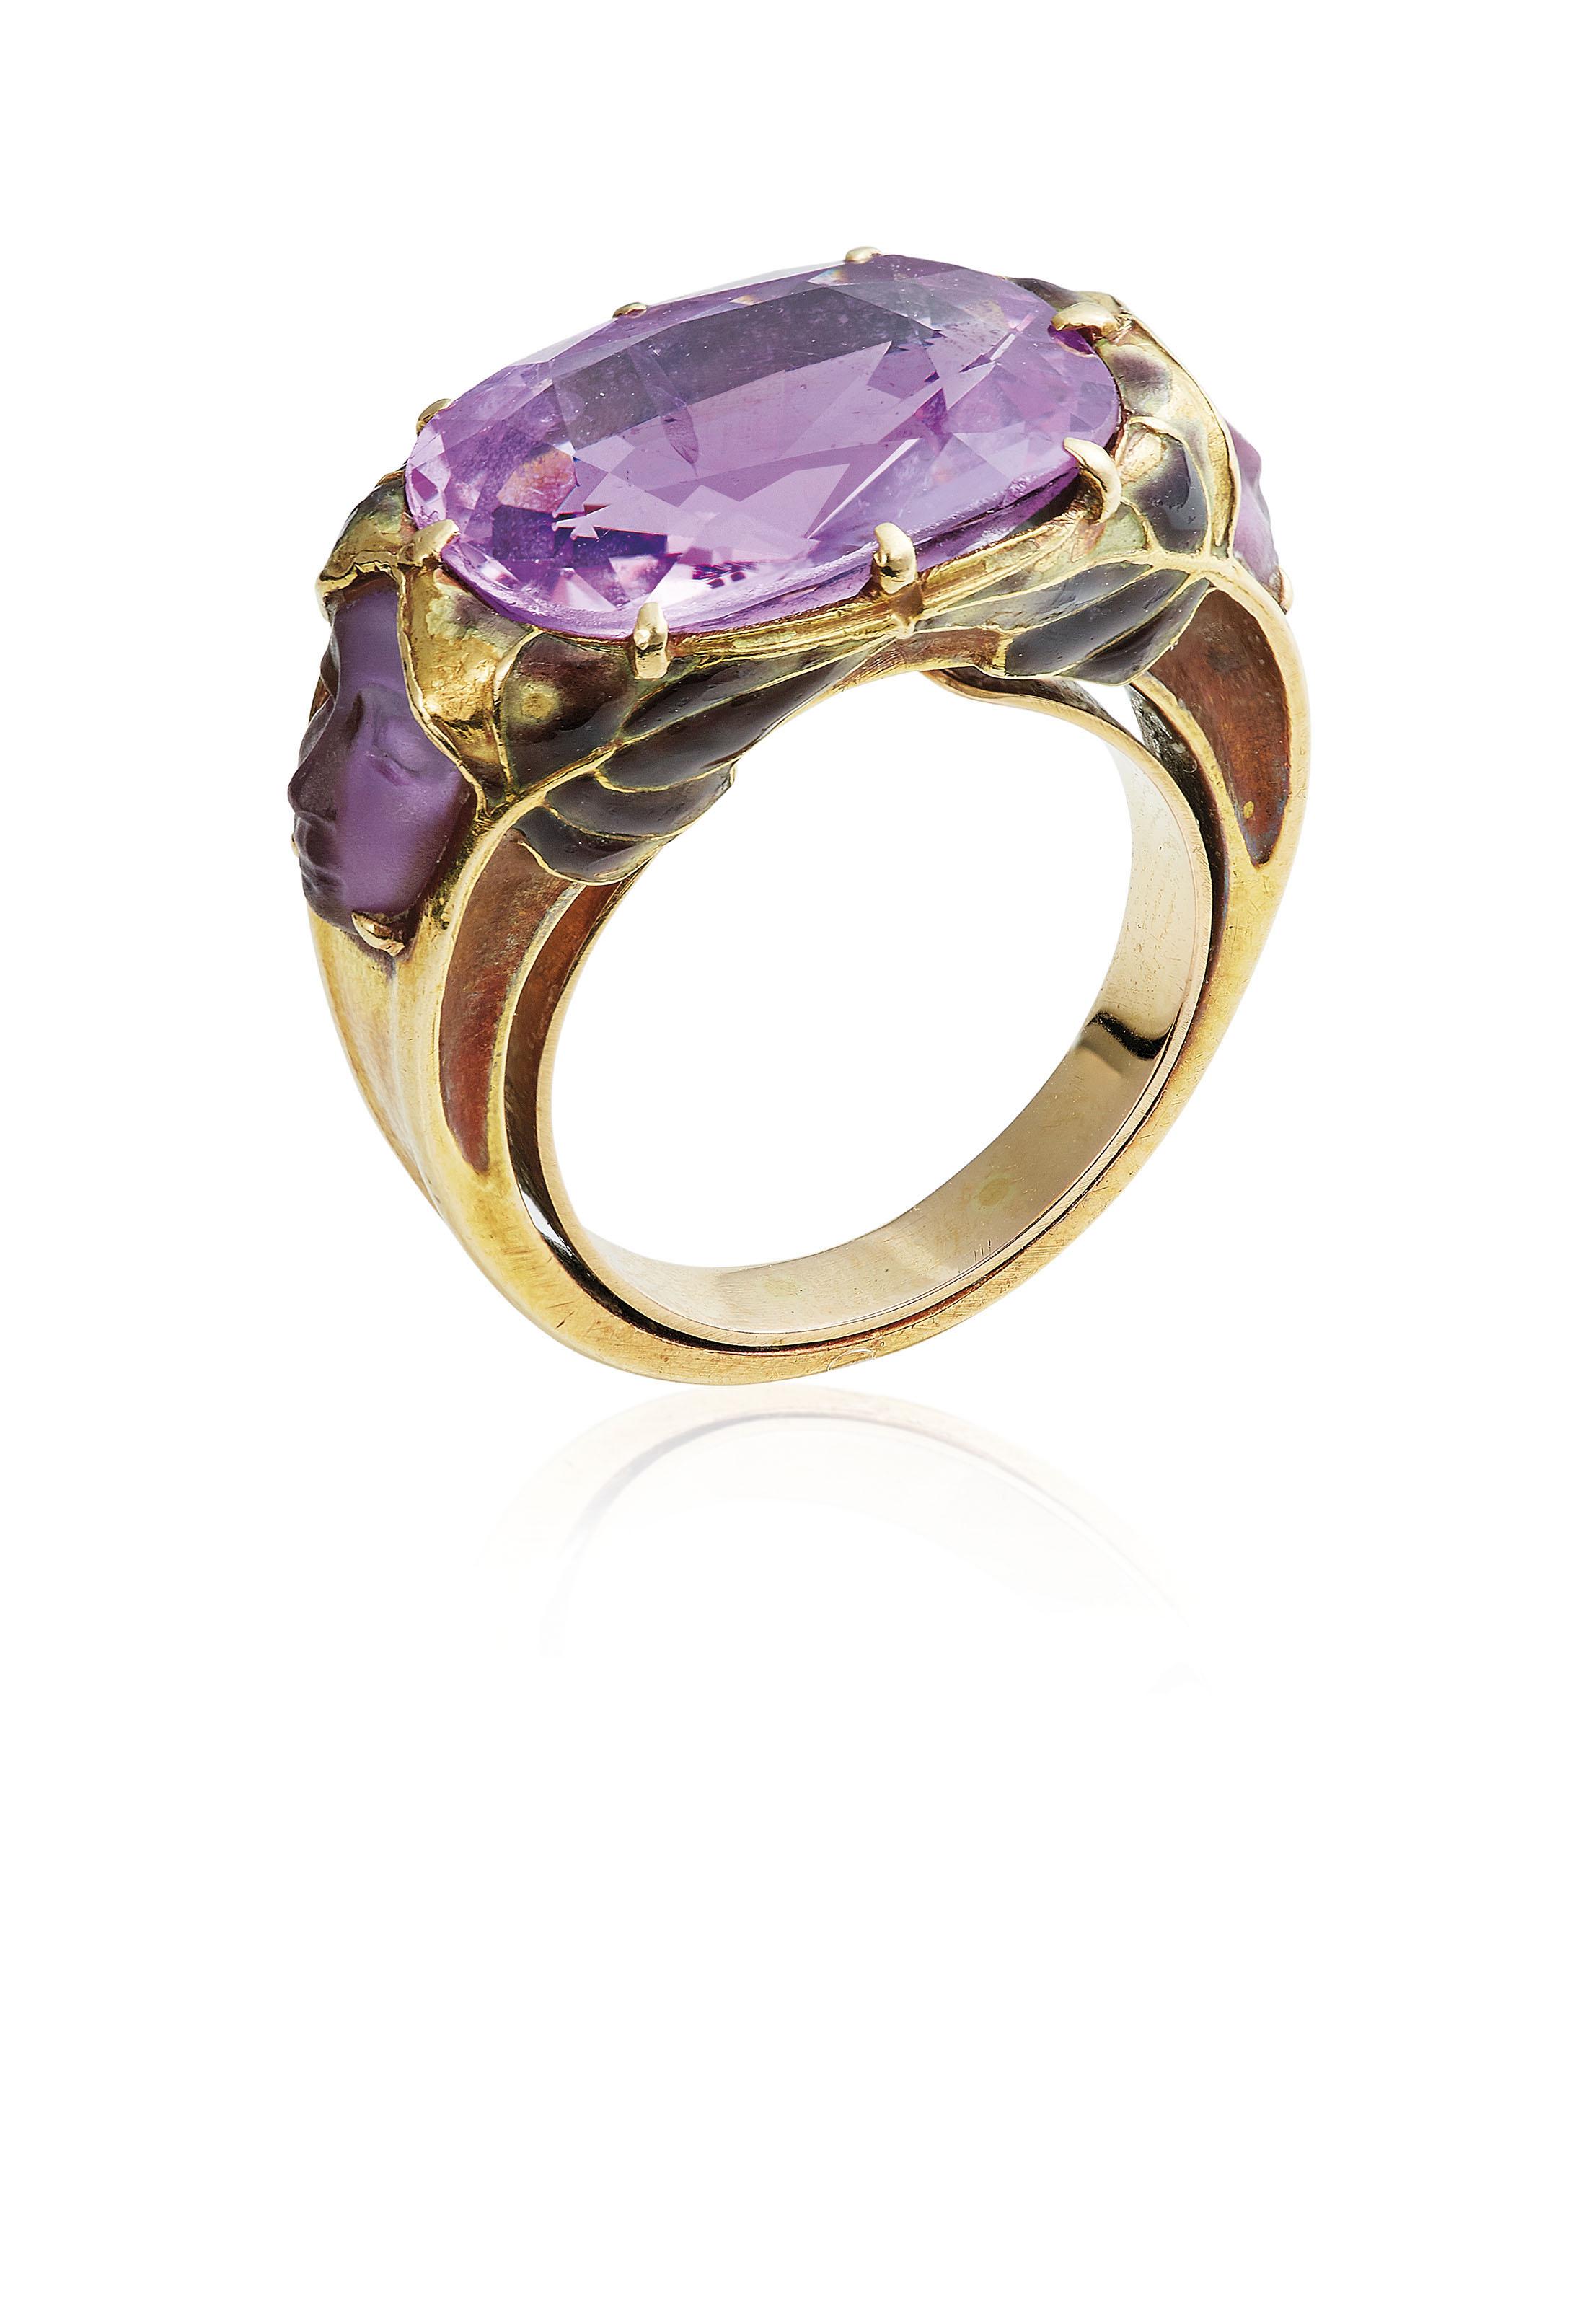 Lalique Ring Price